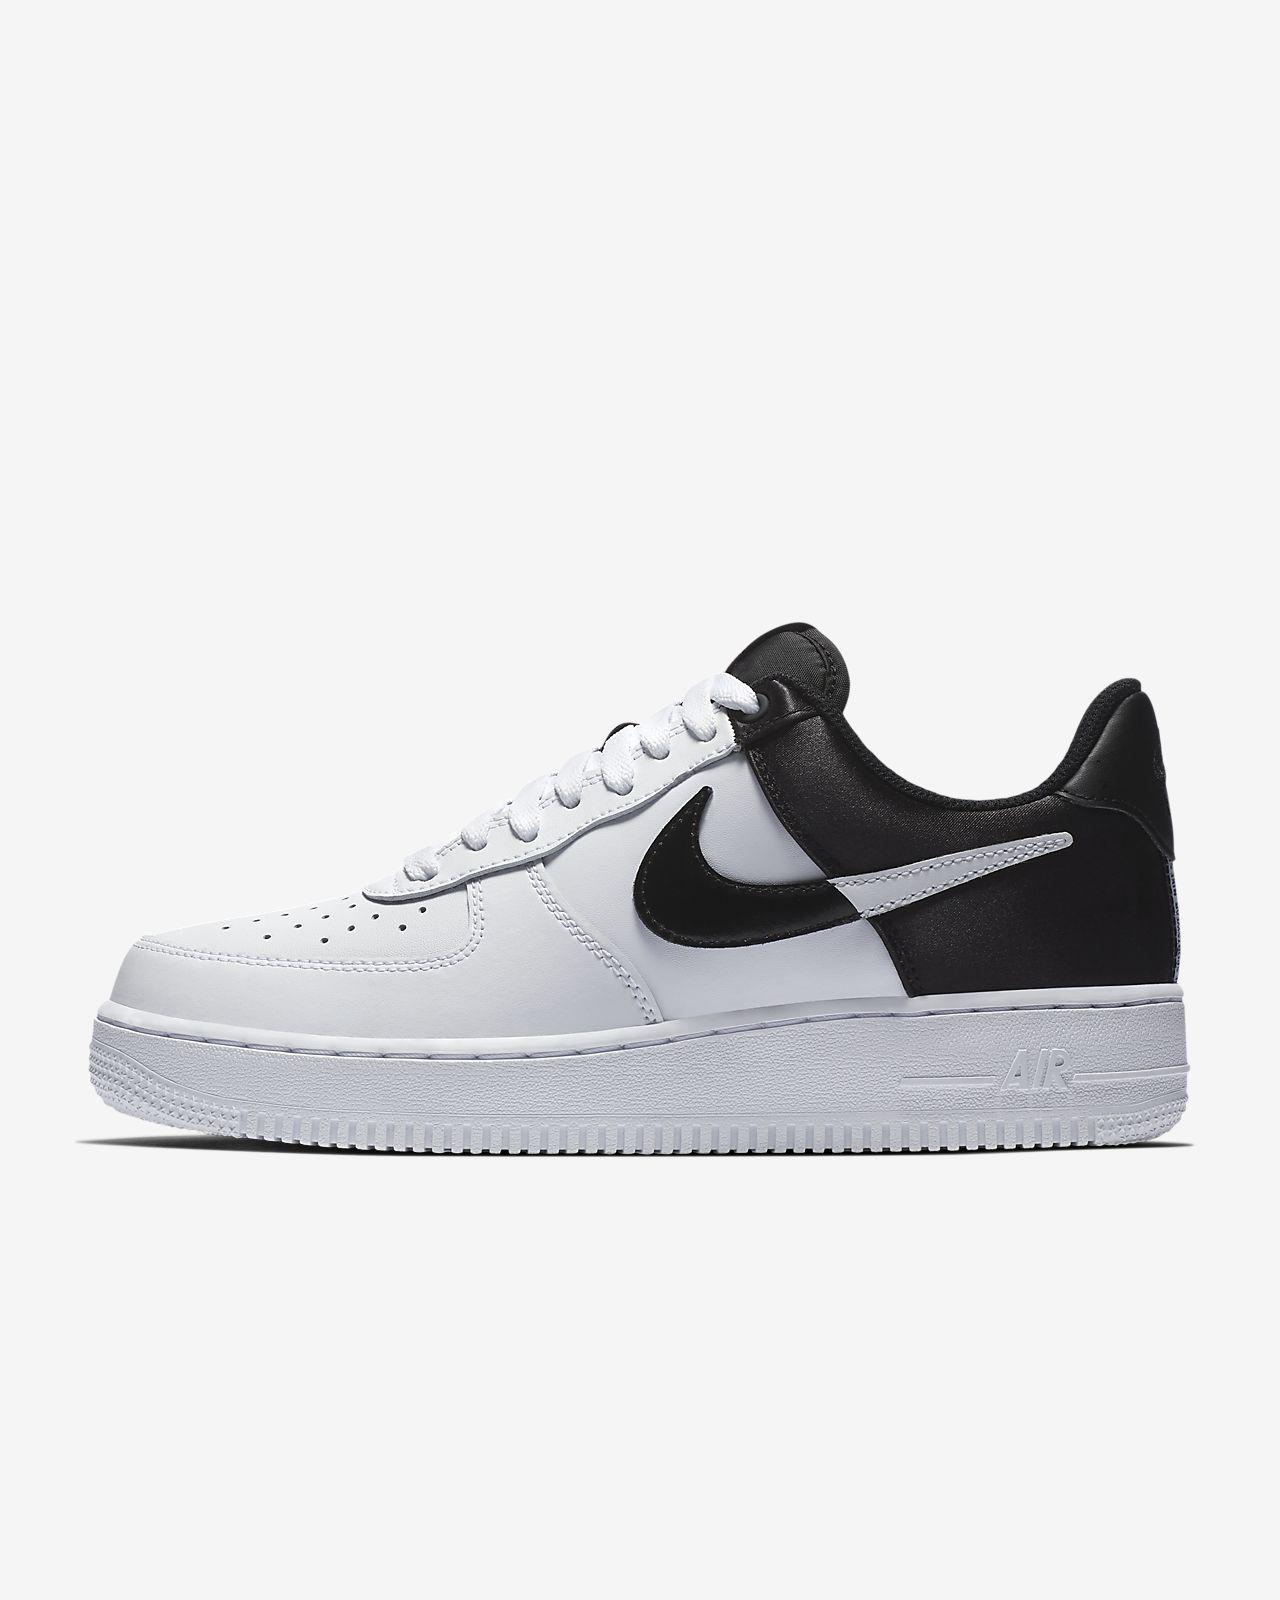 Air Force 1 Low Nike Air Force Nike | Flight Club